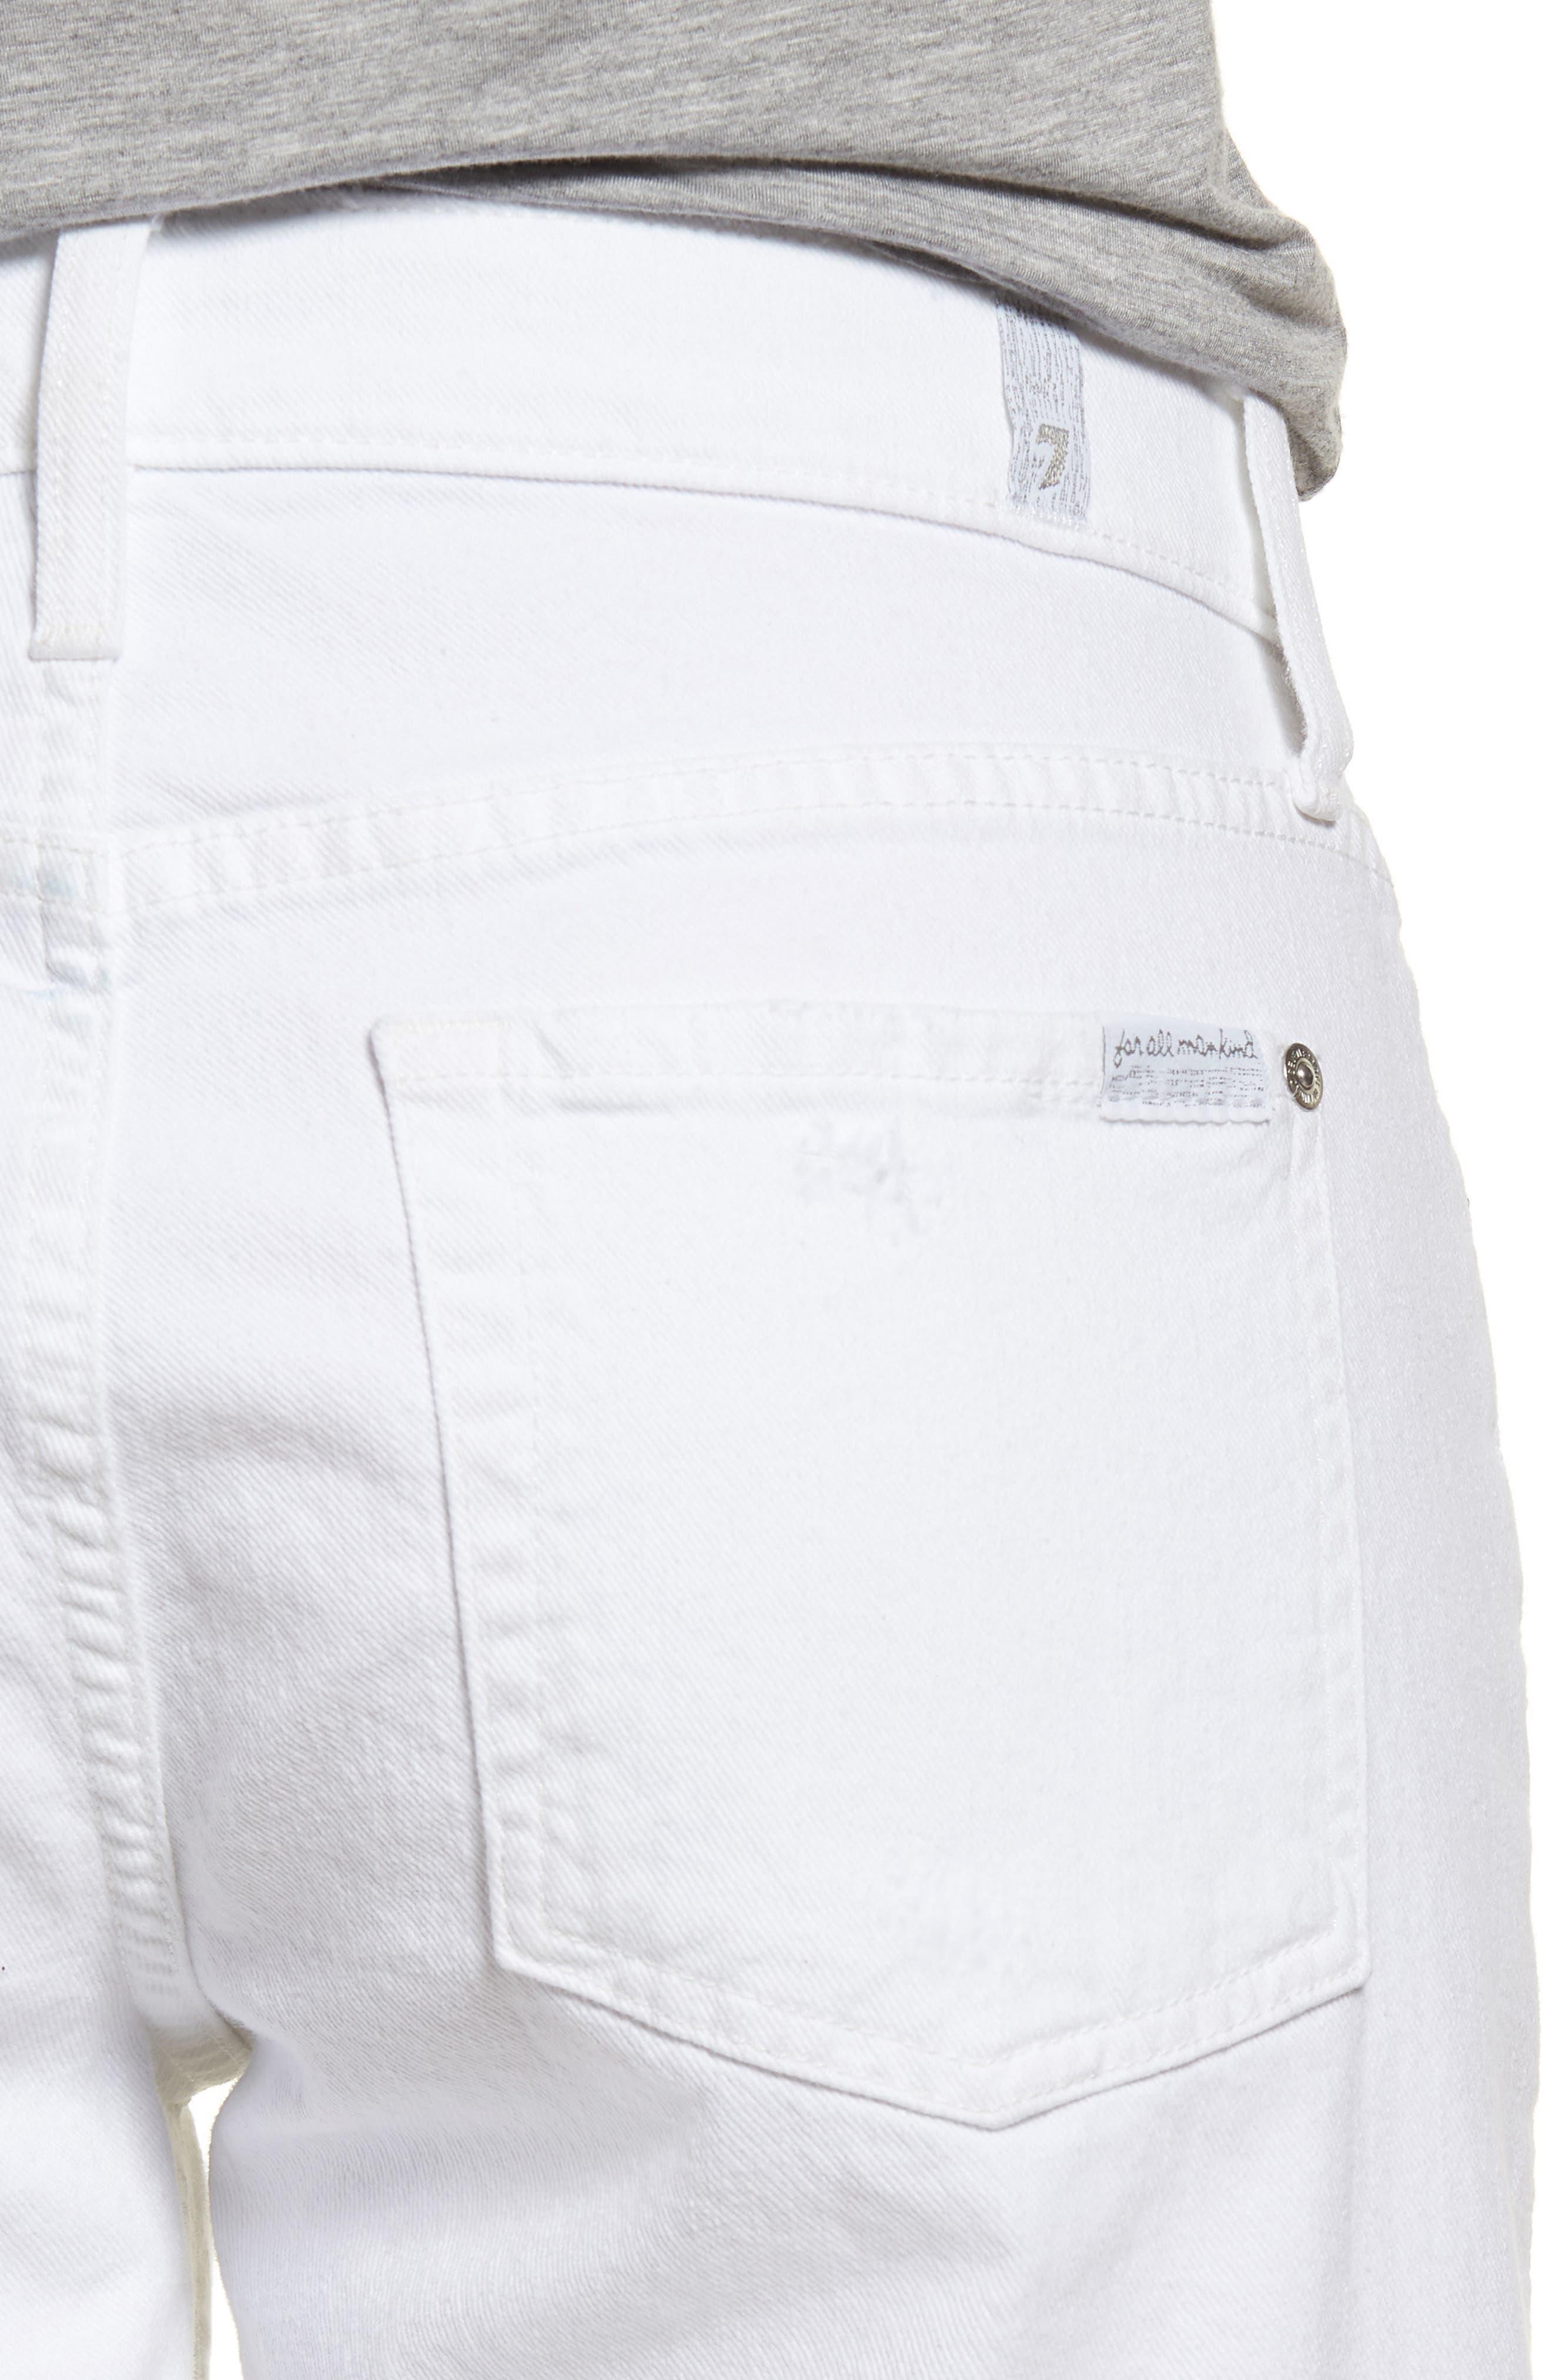 Distressed High Waist Straight Leg Bermuda Shorts,                             Alternate thumbnail 4, color,                             102